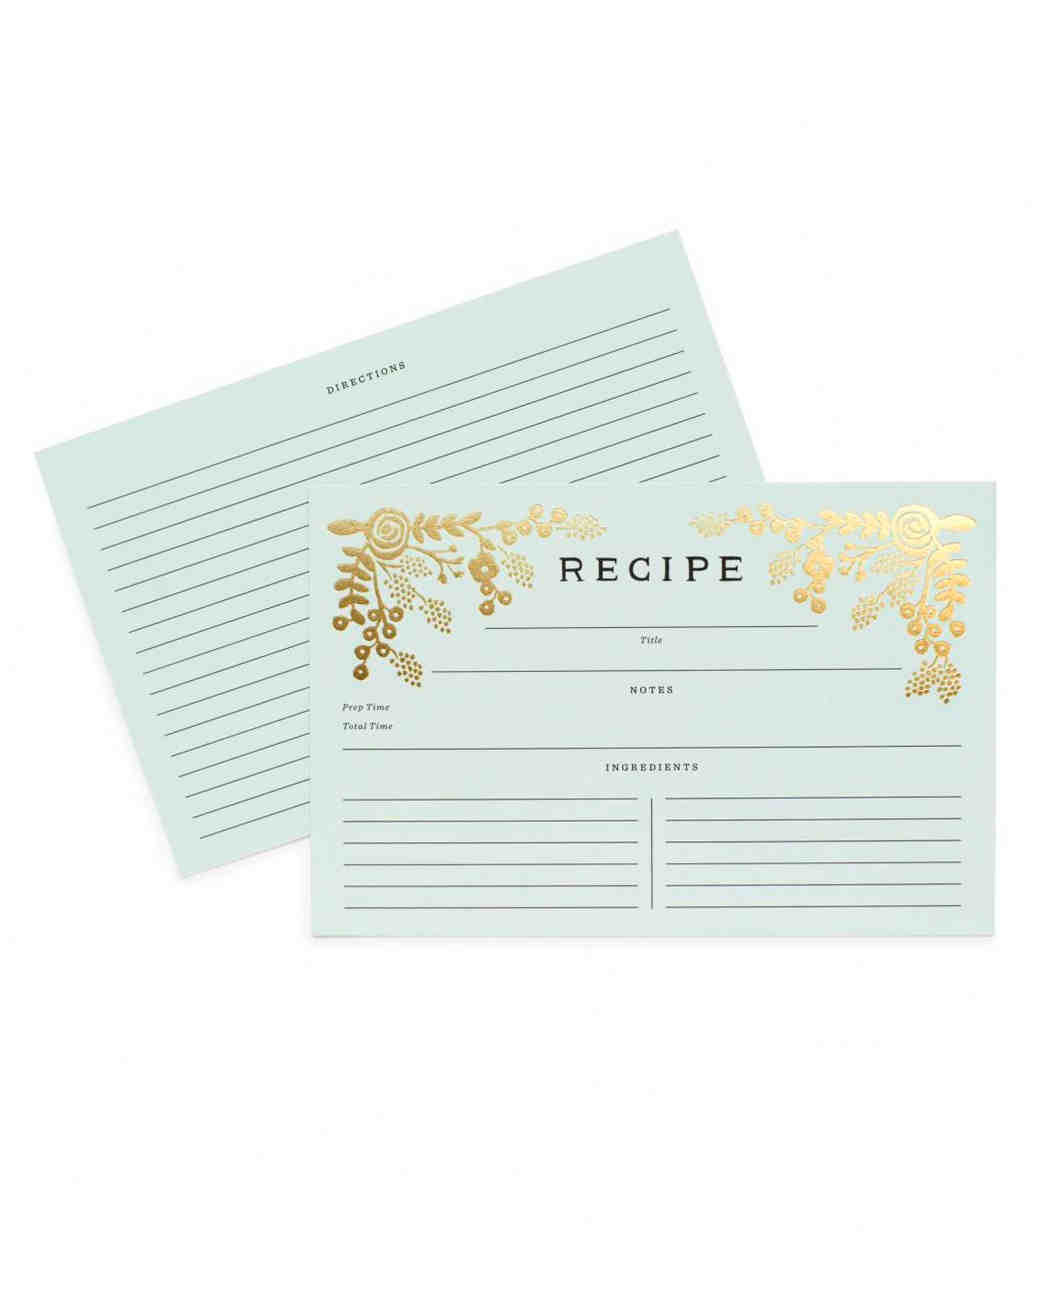 recipe-cards-riflepaperco-golden-garden-0315.jpg